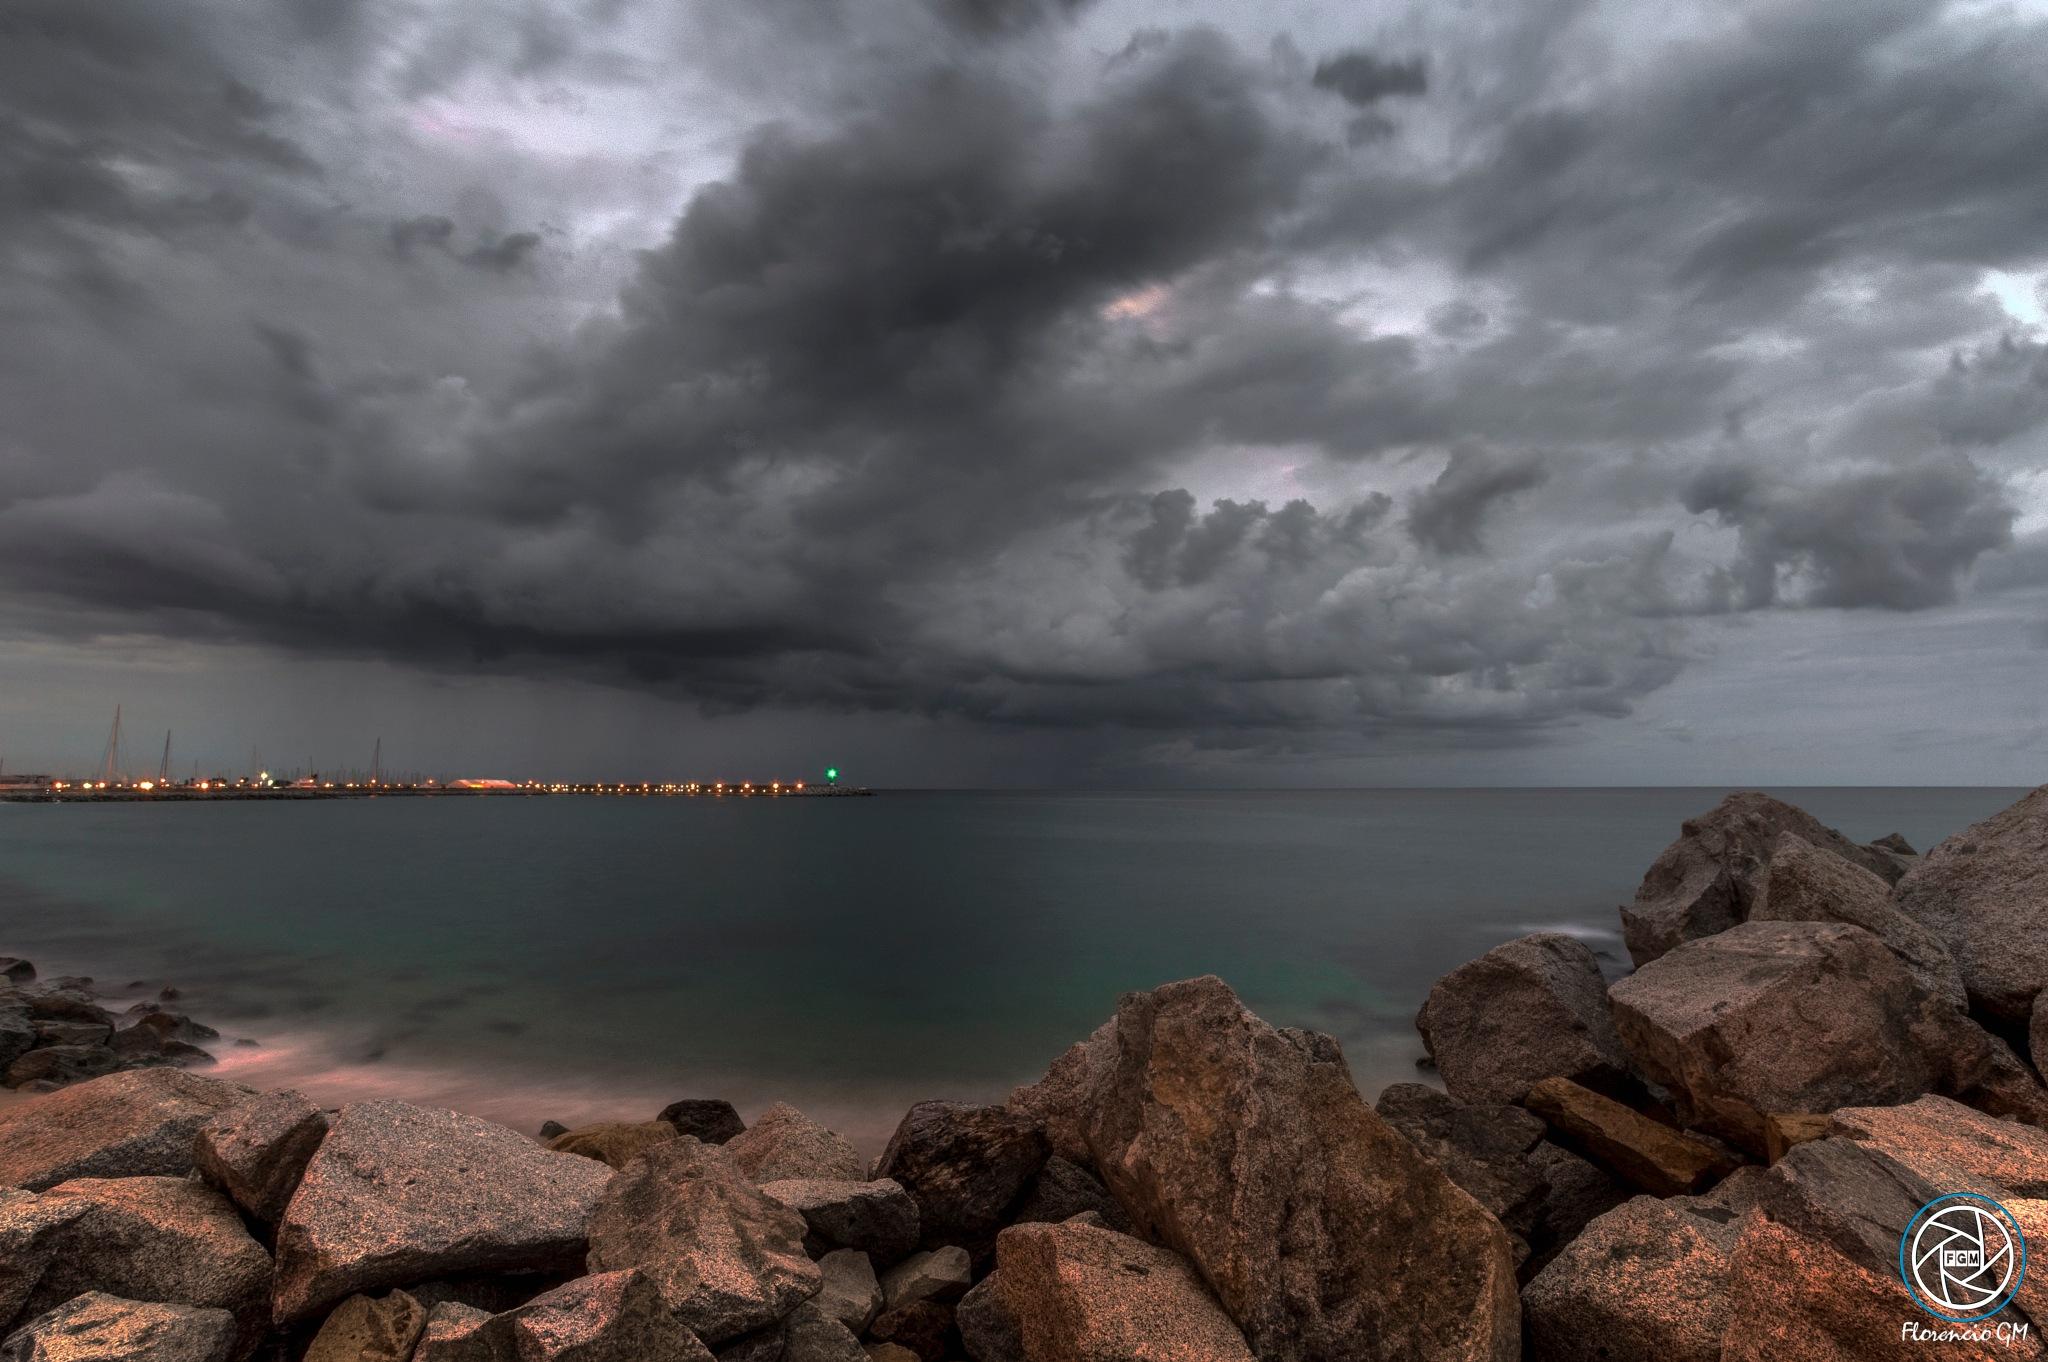 He threatened, but finaly, has not fallen a drop Playa de Poniente by Florencio GM